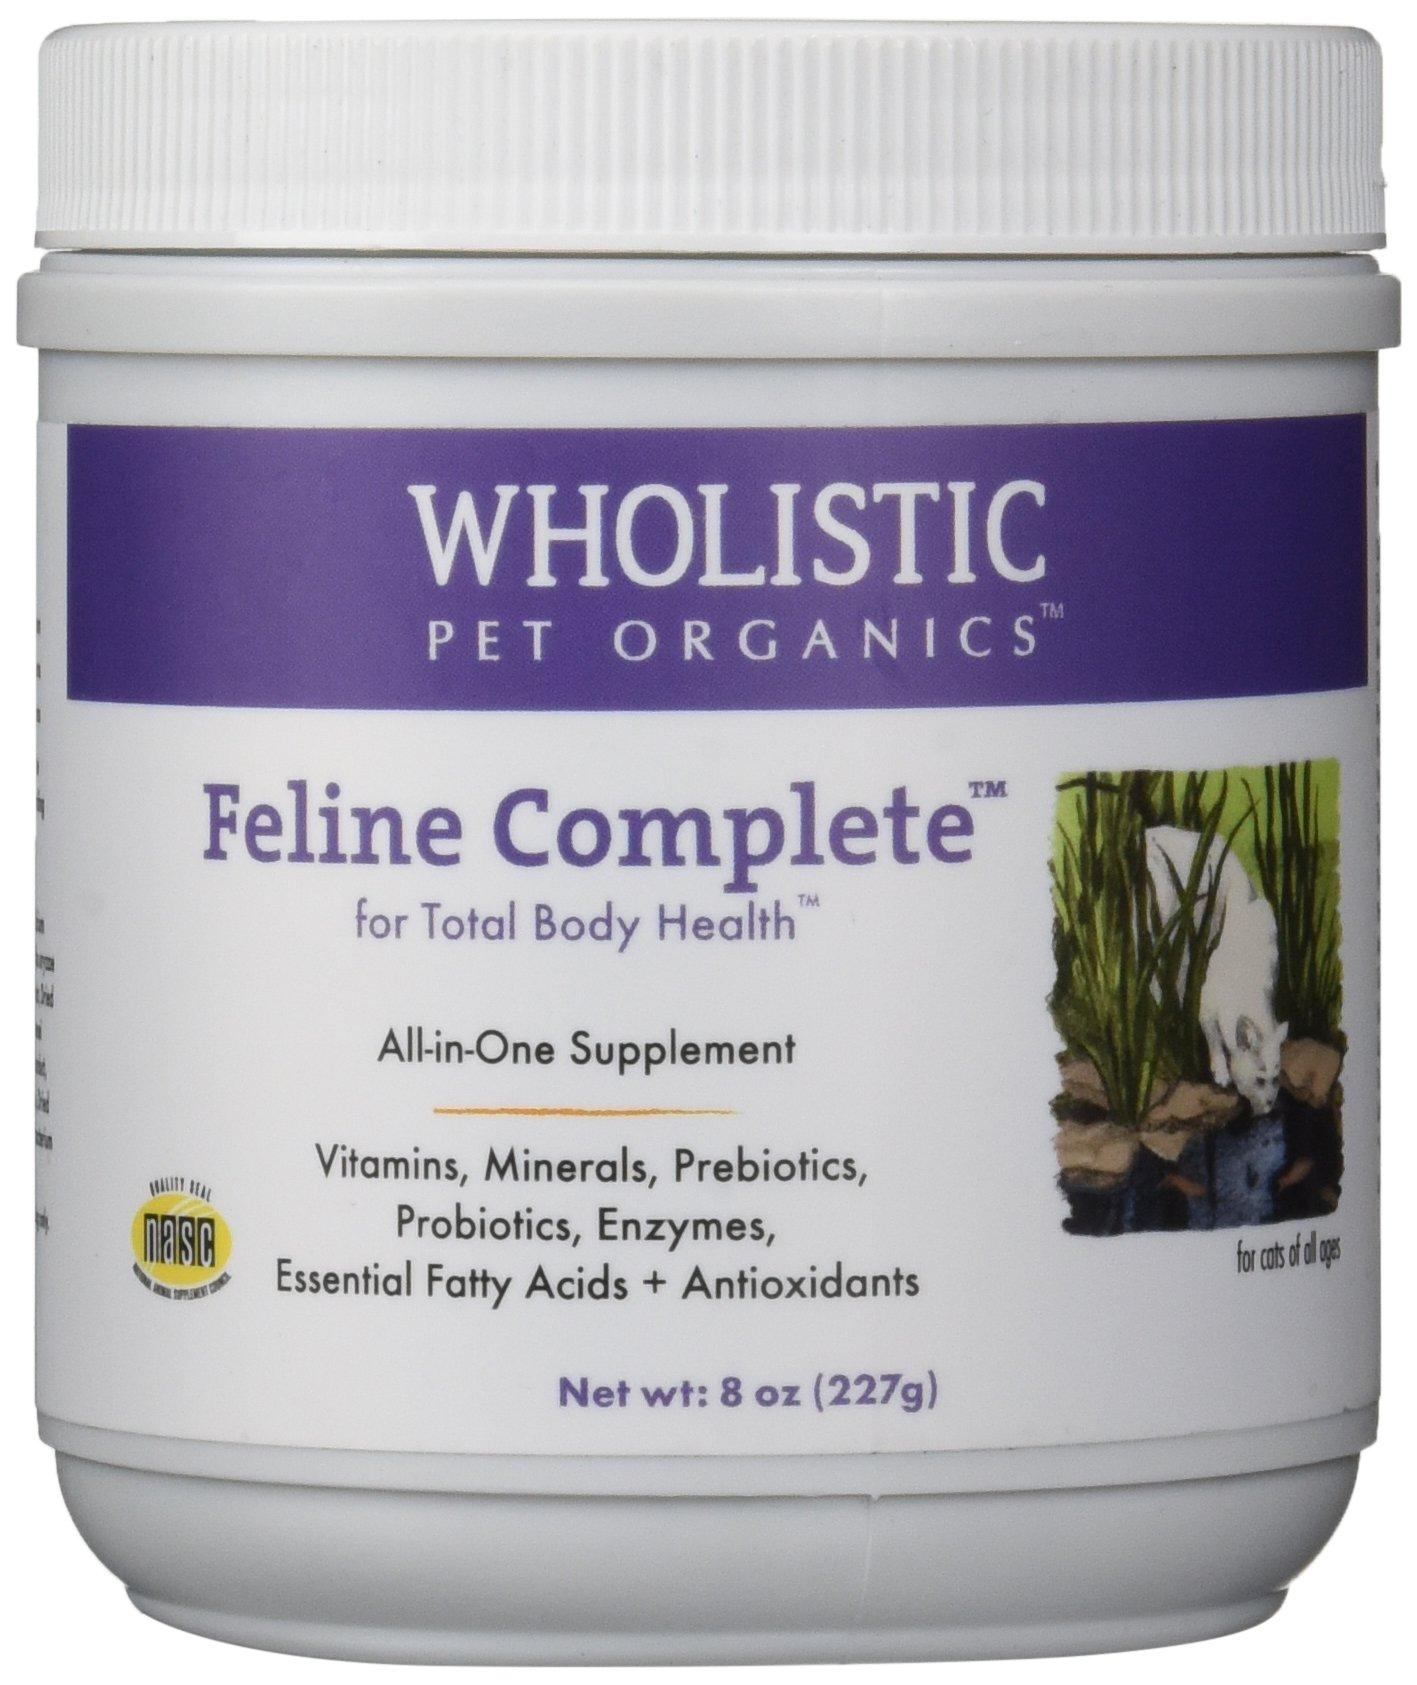 Wholistic Pet Organics Feline Complete Multivitamin, 8 oz by Wholistic Pet Organics